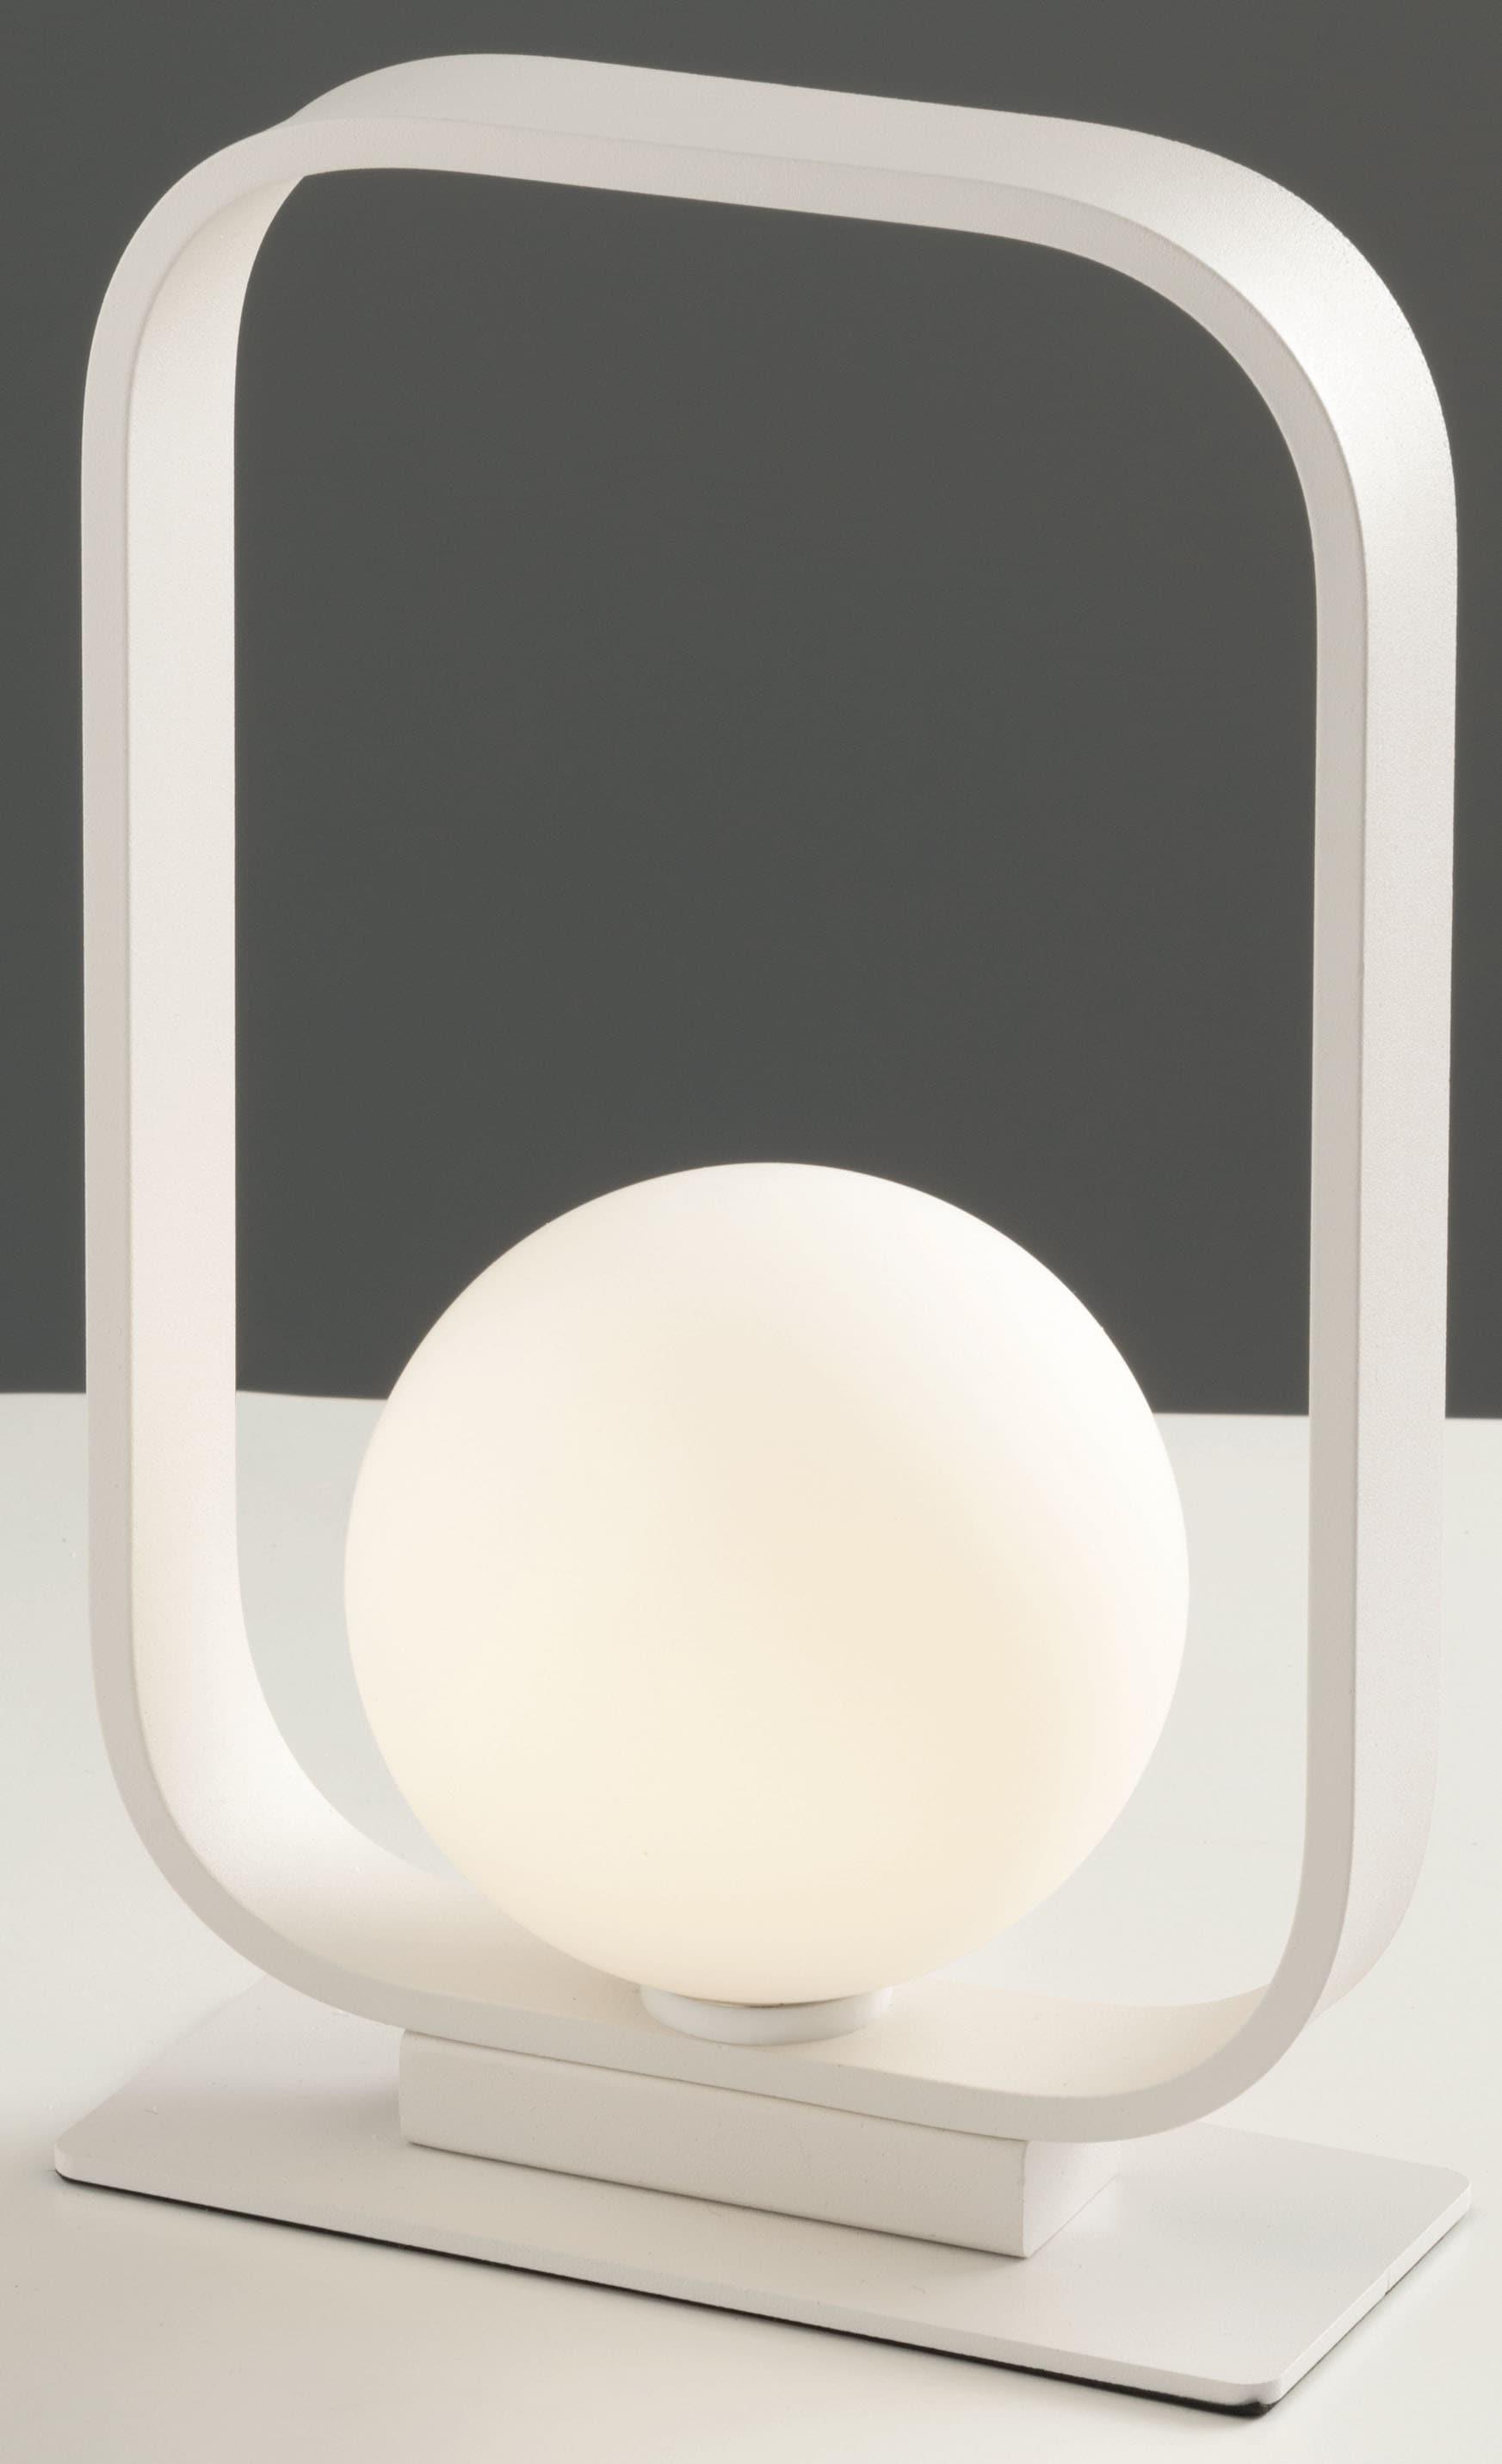 LUCE Design Tischleuchte I-ROXY-L1, G9, 1 St.